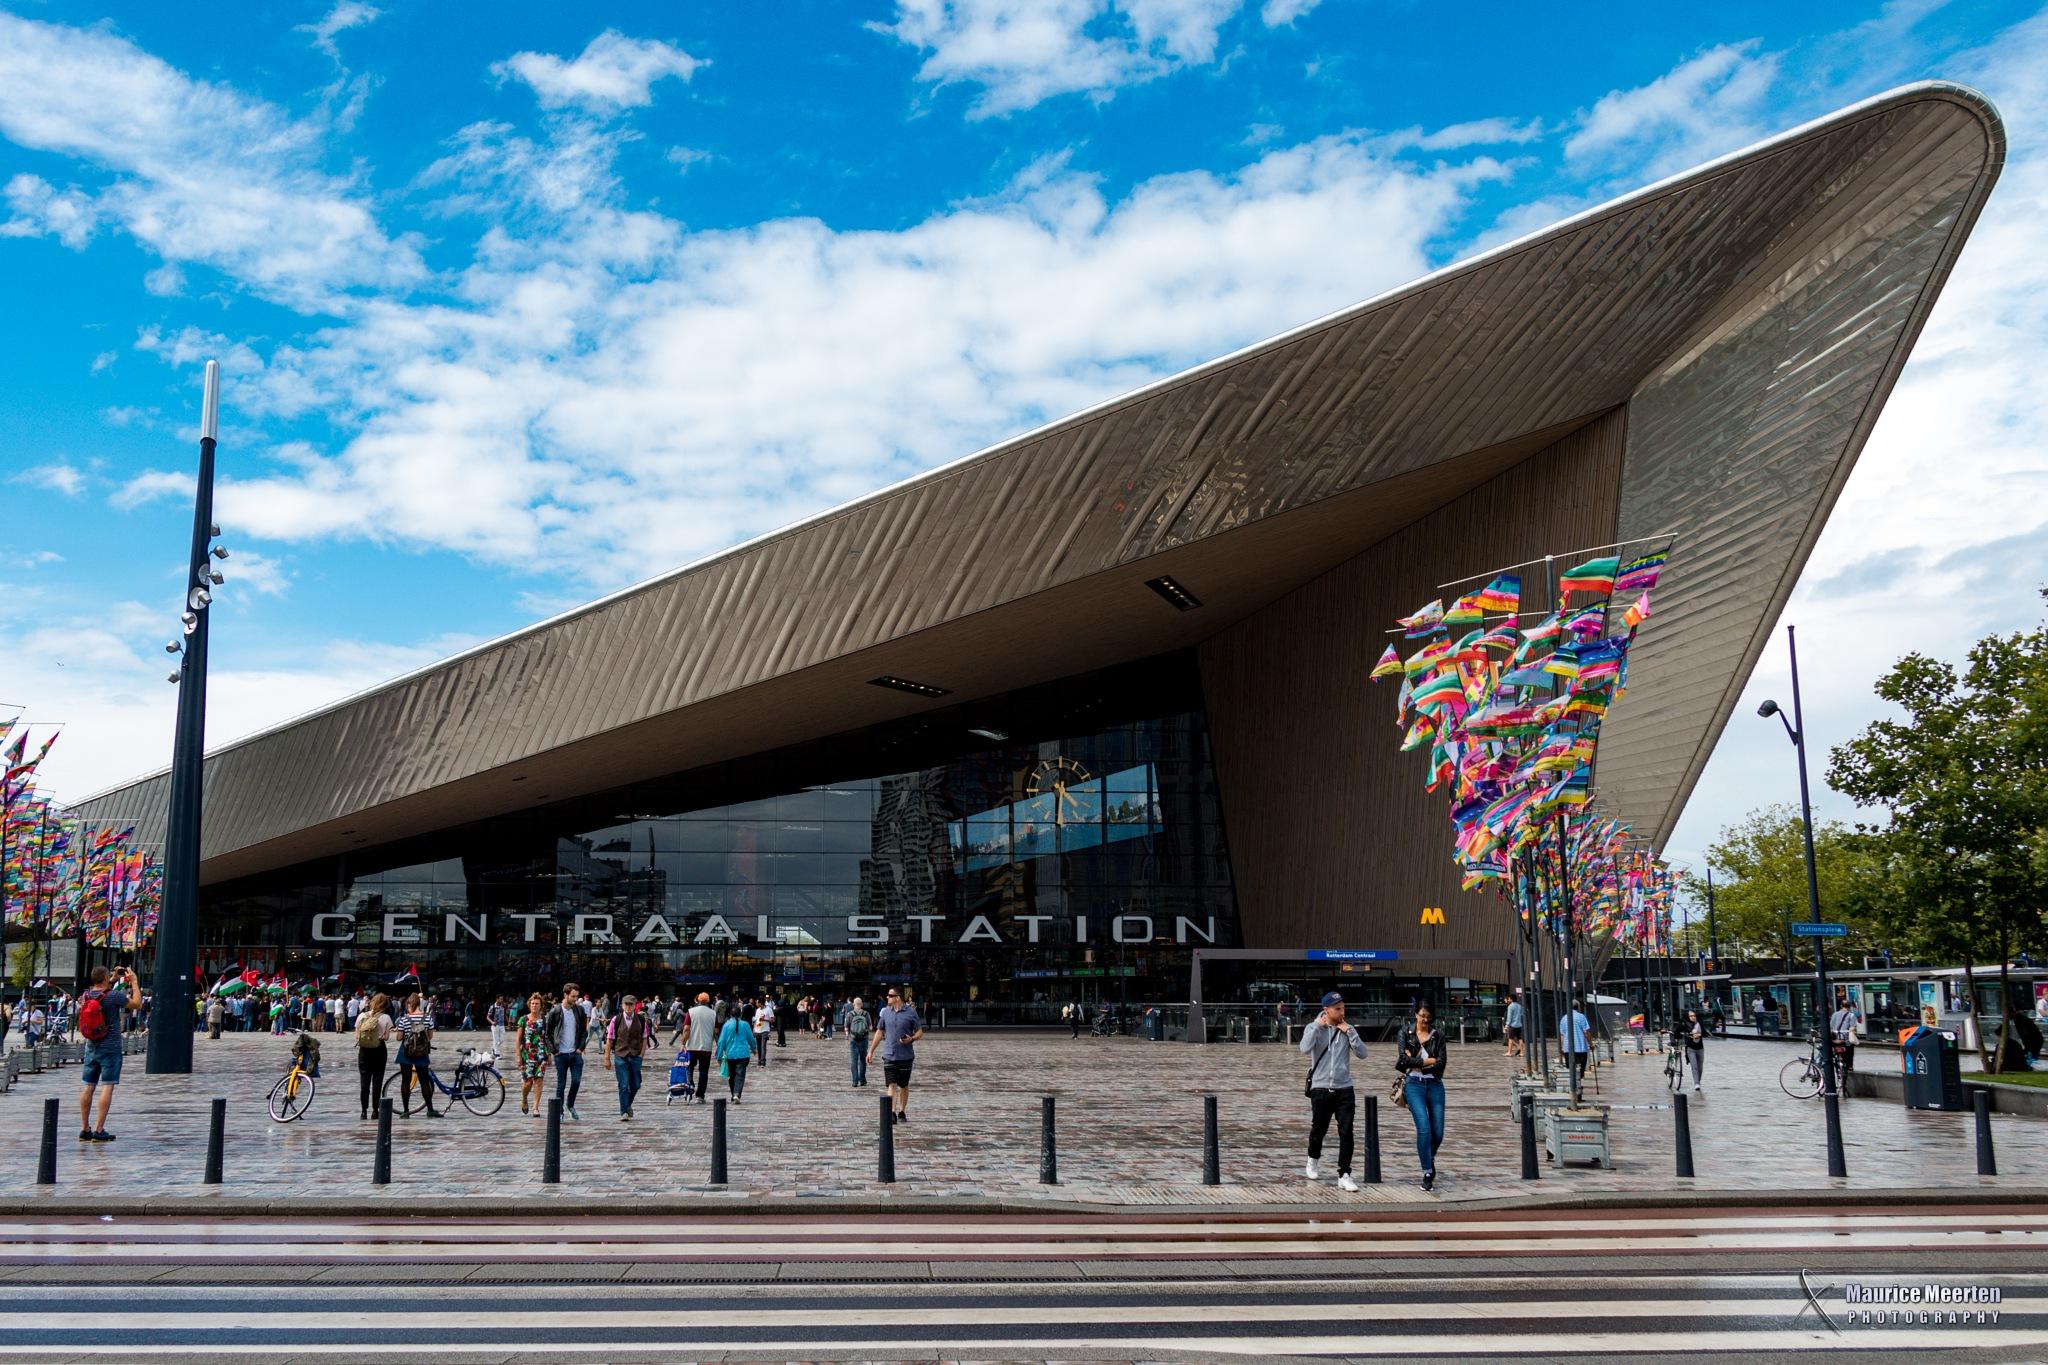 Rotterdam - Centraal Station by Maurice Meerten